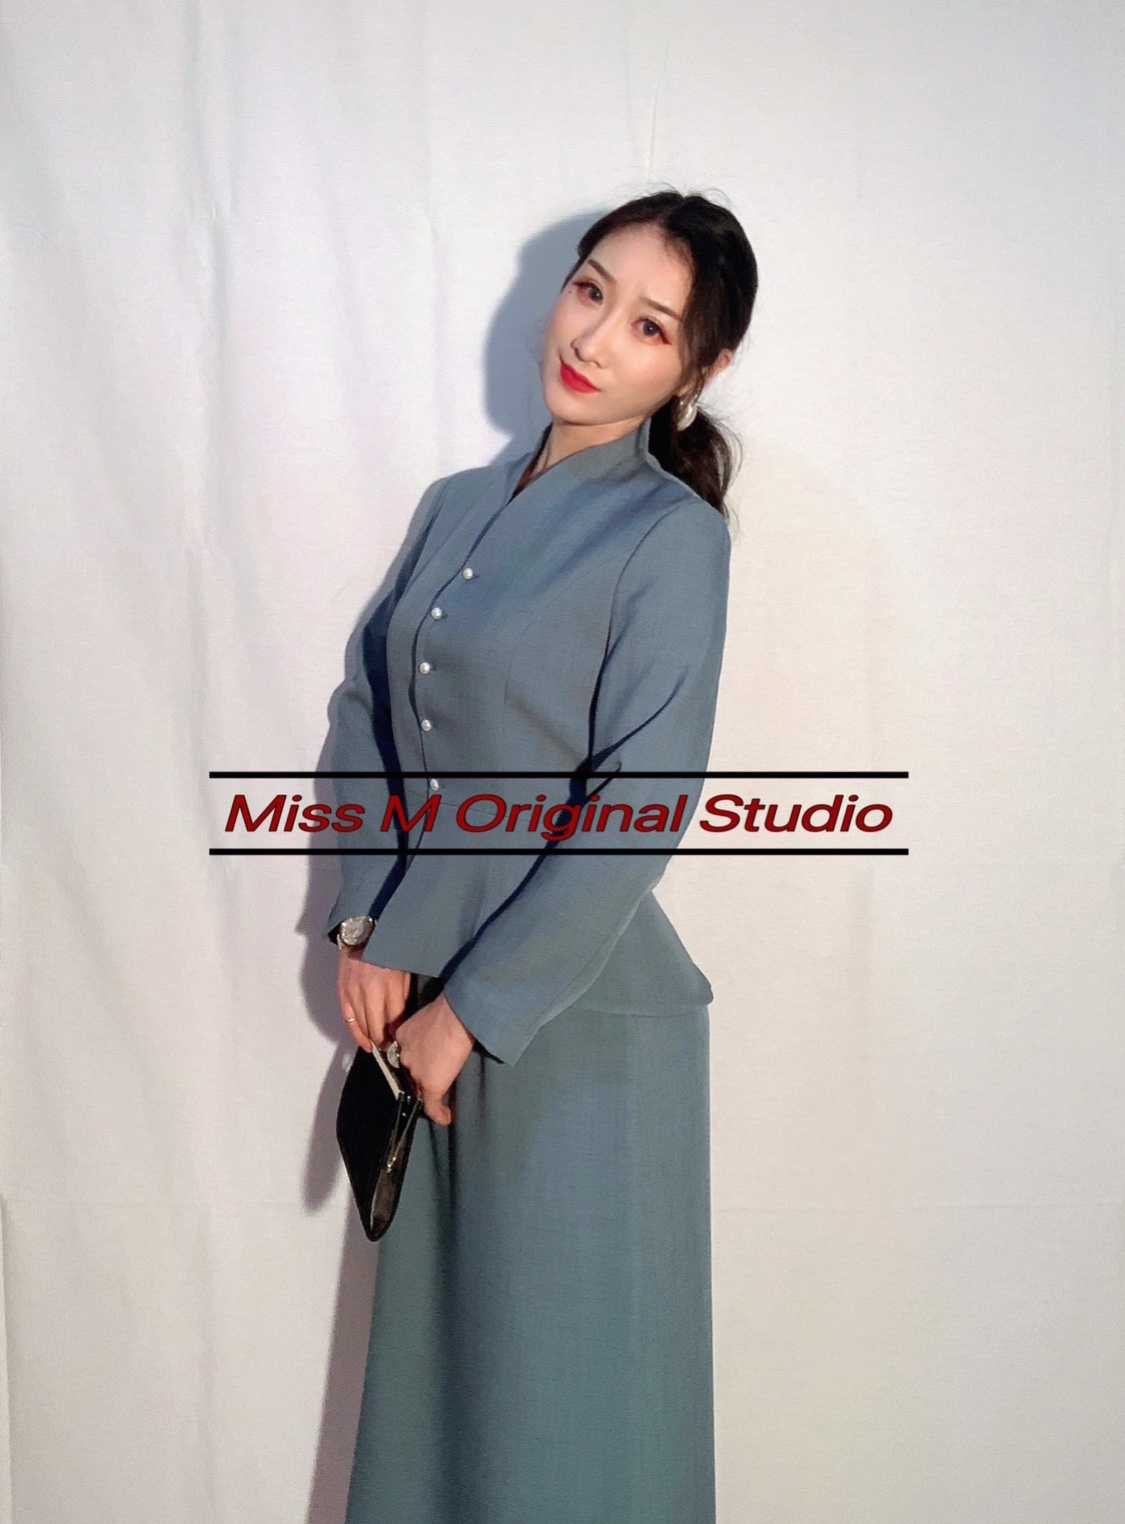 Miss M2020春季新女气质优雅纯色收腰显身材重工高端套装上衣套裙